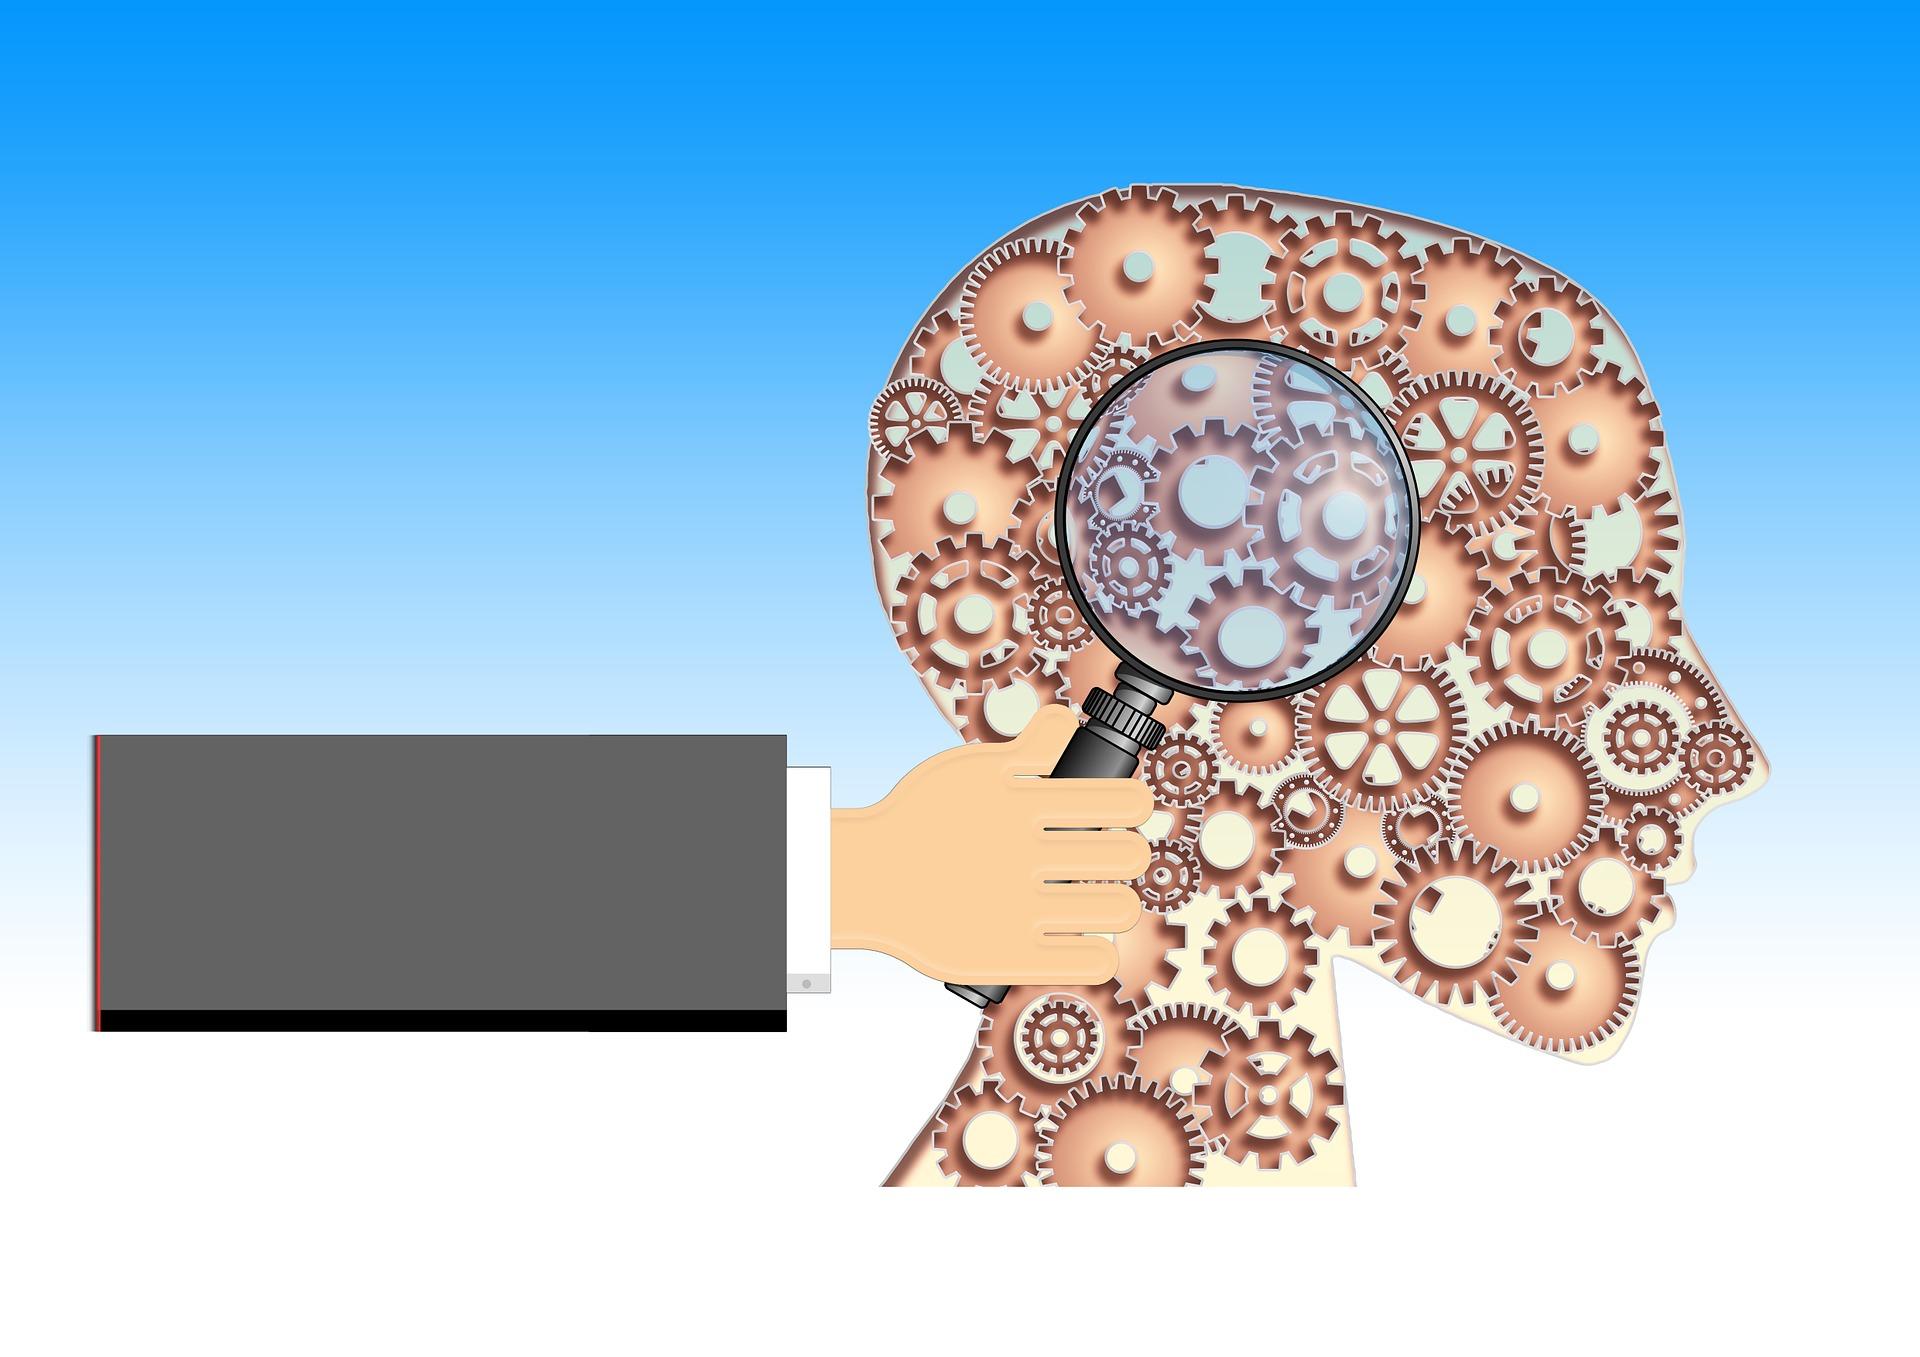 brainhand-982048_1920